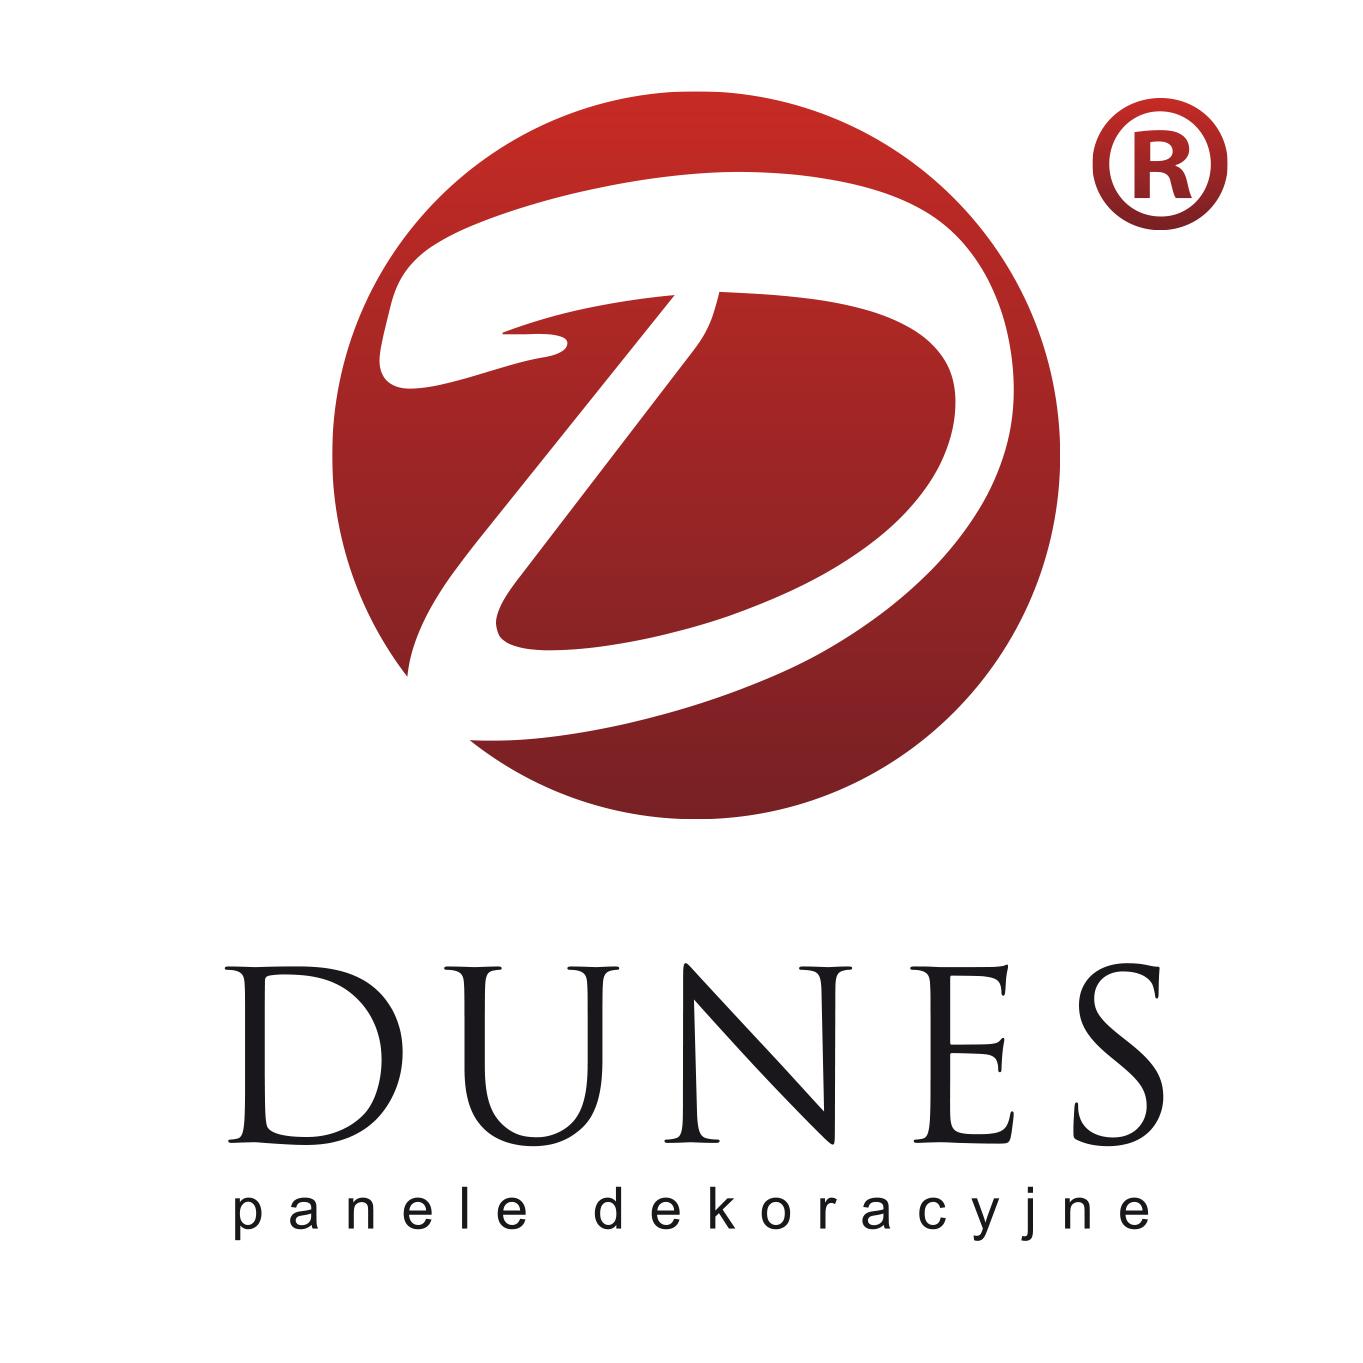 Dunes i Nowy Wzór